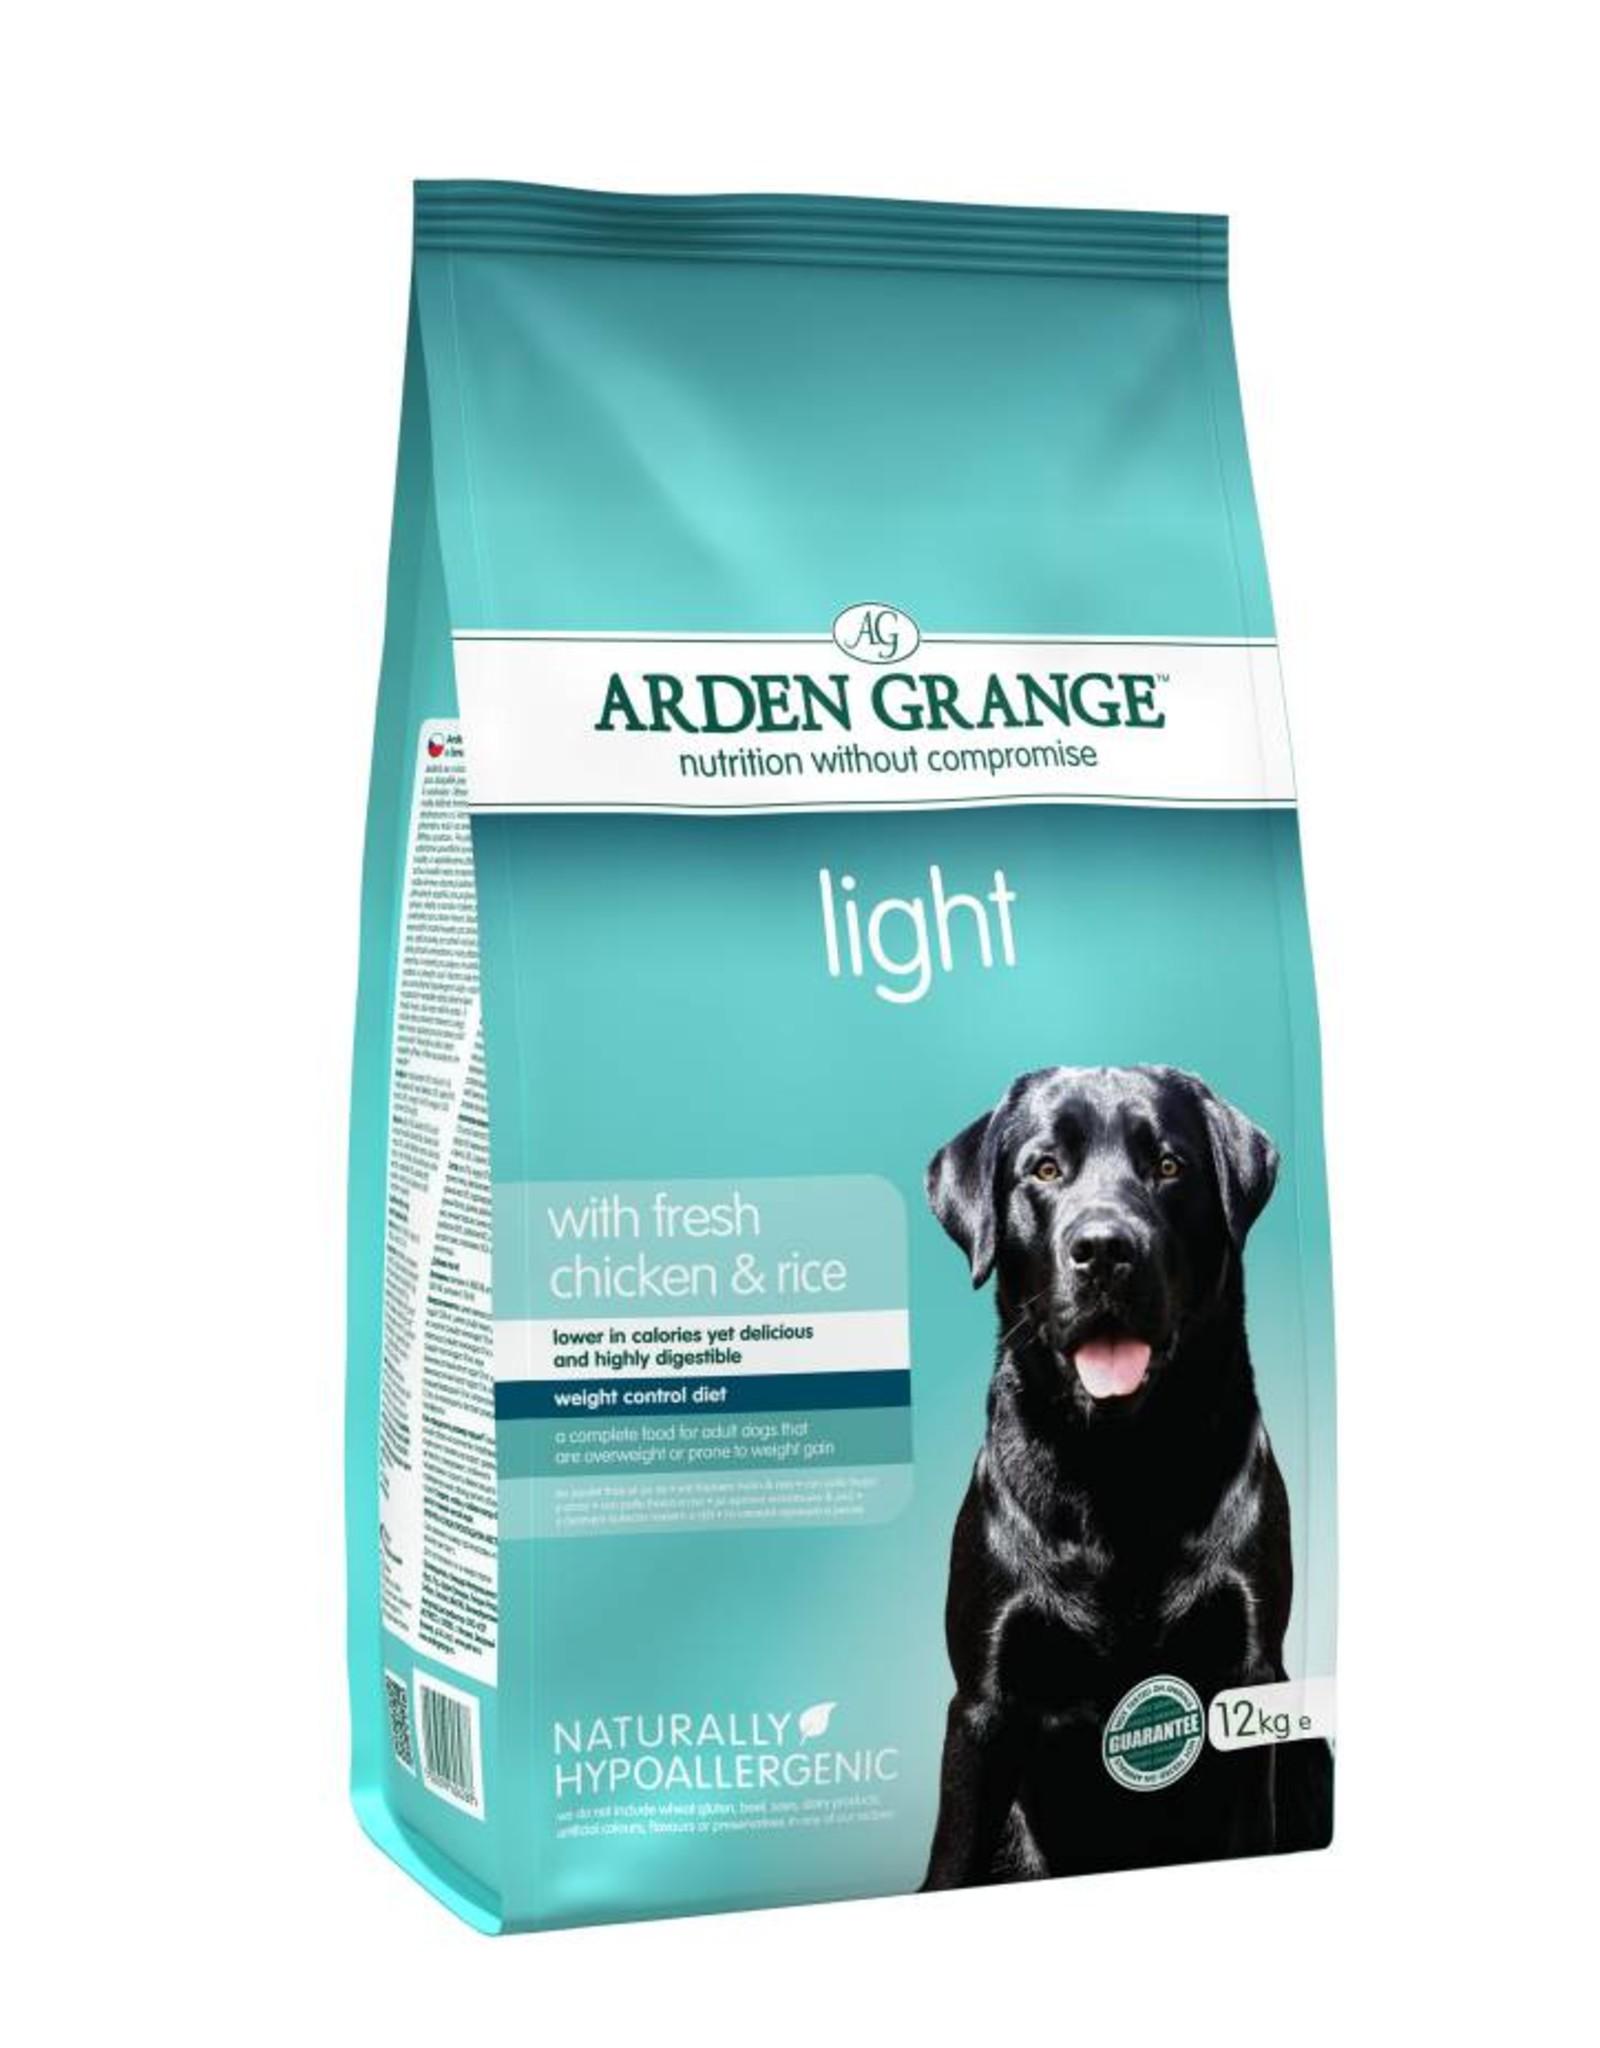 Arden Grange Light Adult Dog Dry Food, Chicken & Rice